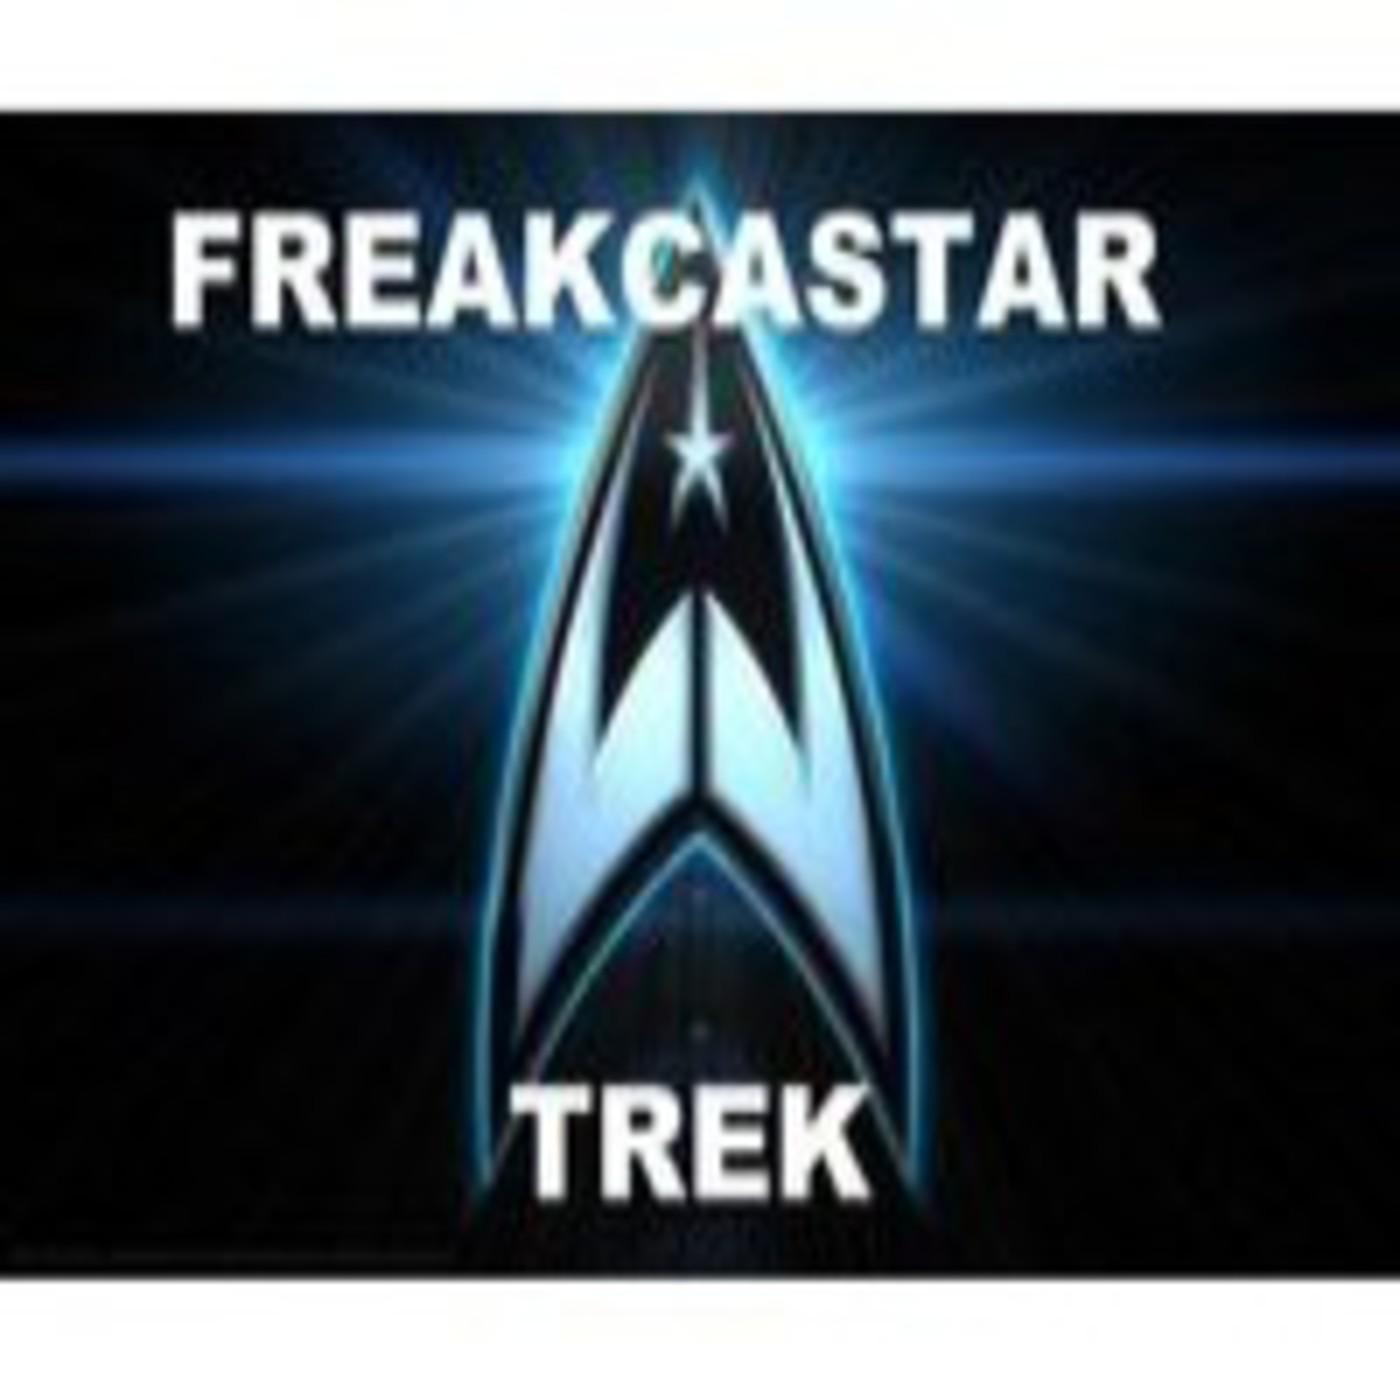 FreakCast 2.0 episodio 14: Star Trek.